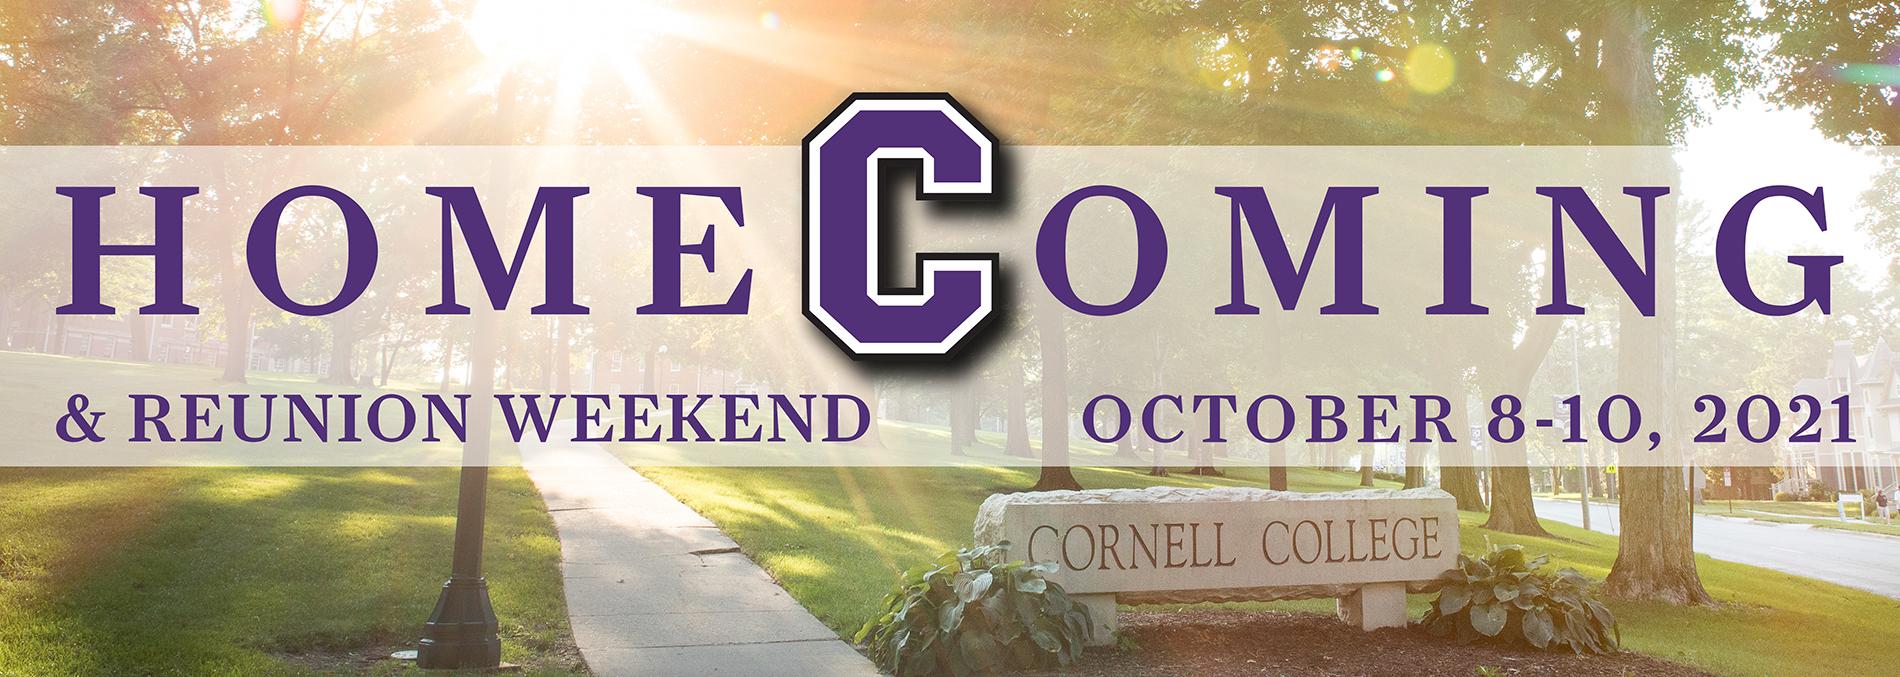 Cornell Homecoming 2021 banner, Oct 8-10